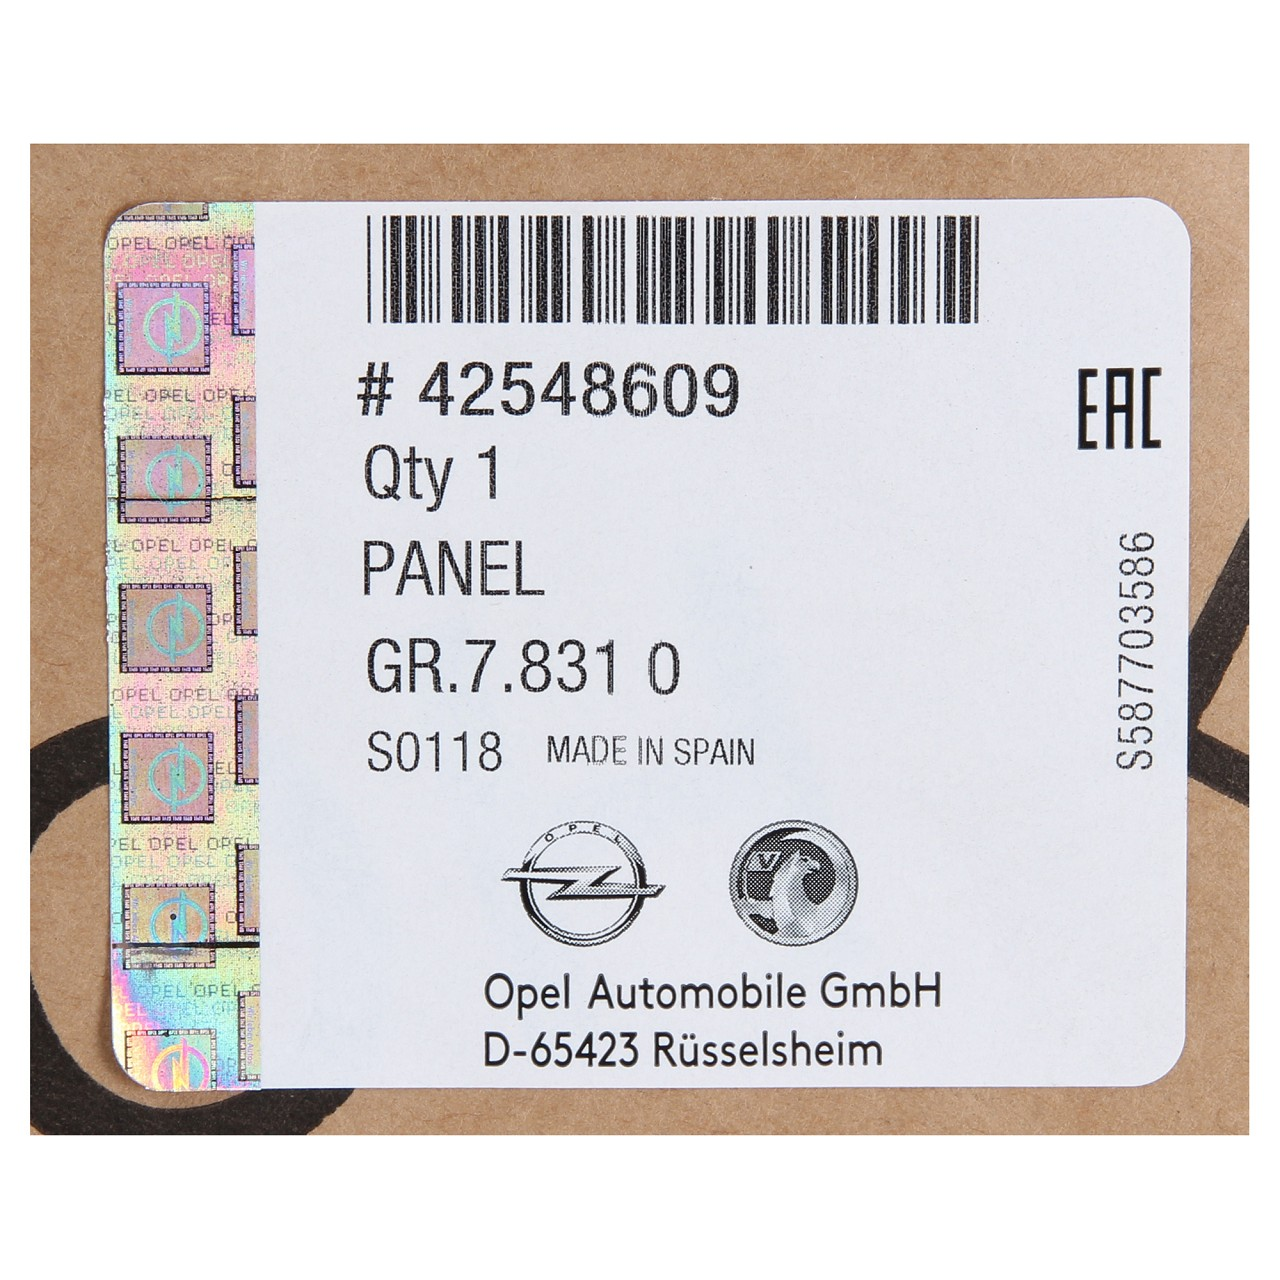 ORIGINAL GM Opel Stoßstange Stoßfänger MOKKA / MOKKA X vorne 42548609